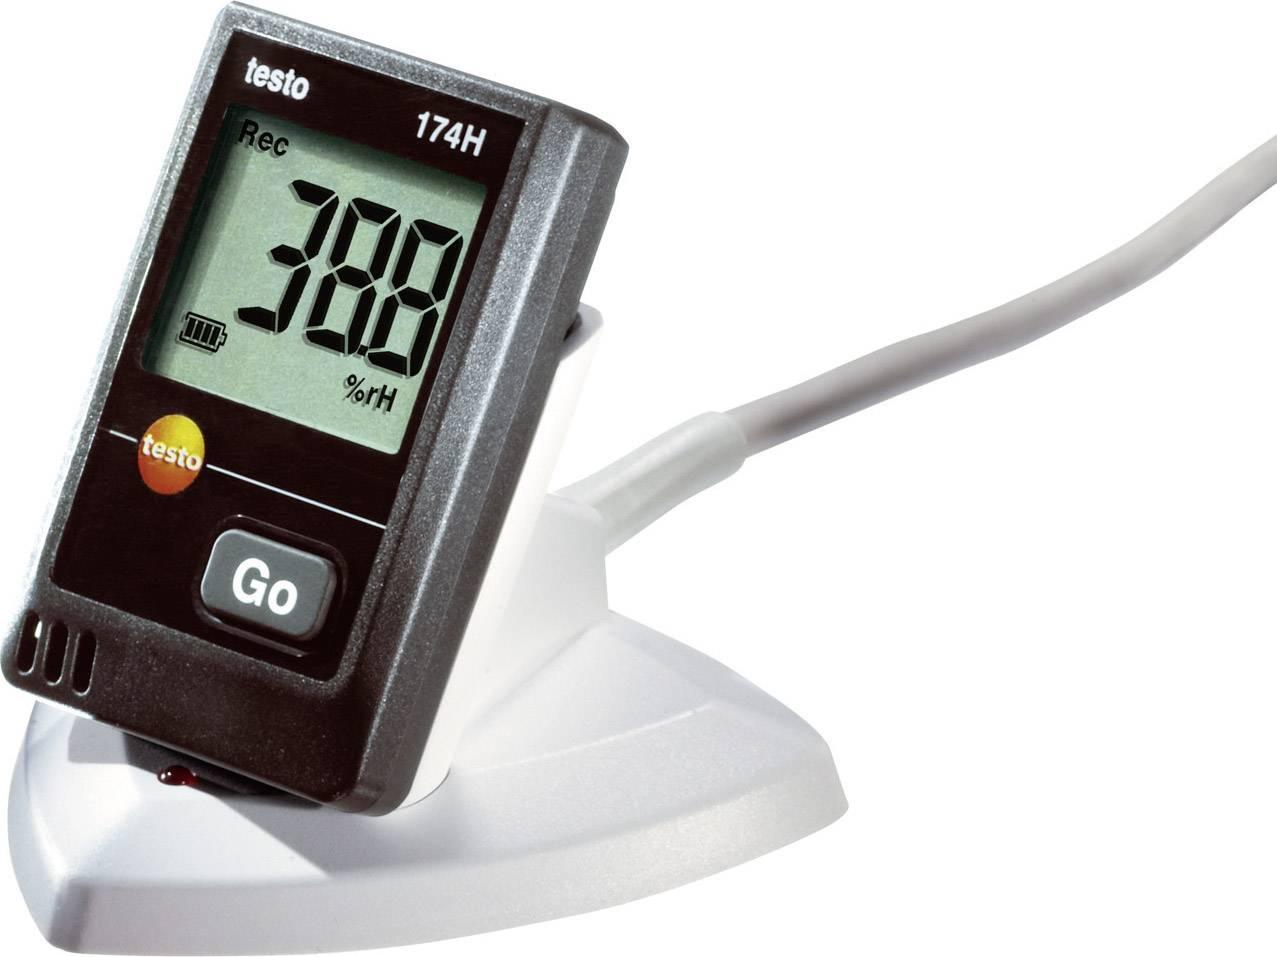 Teplotný datalogger testo 174H sada, -20 až +70 °C